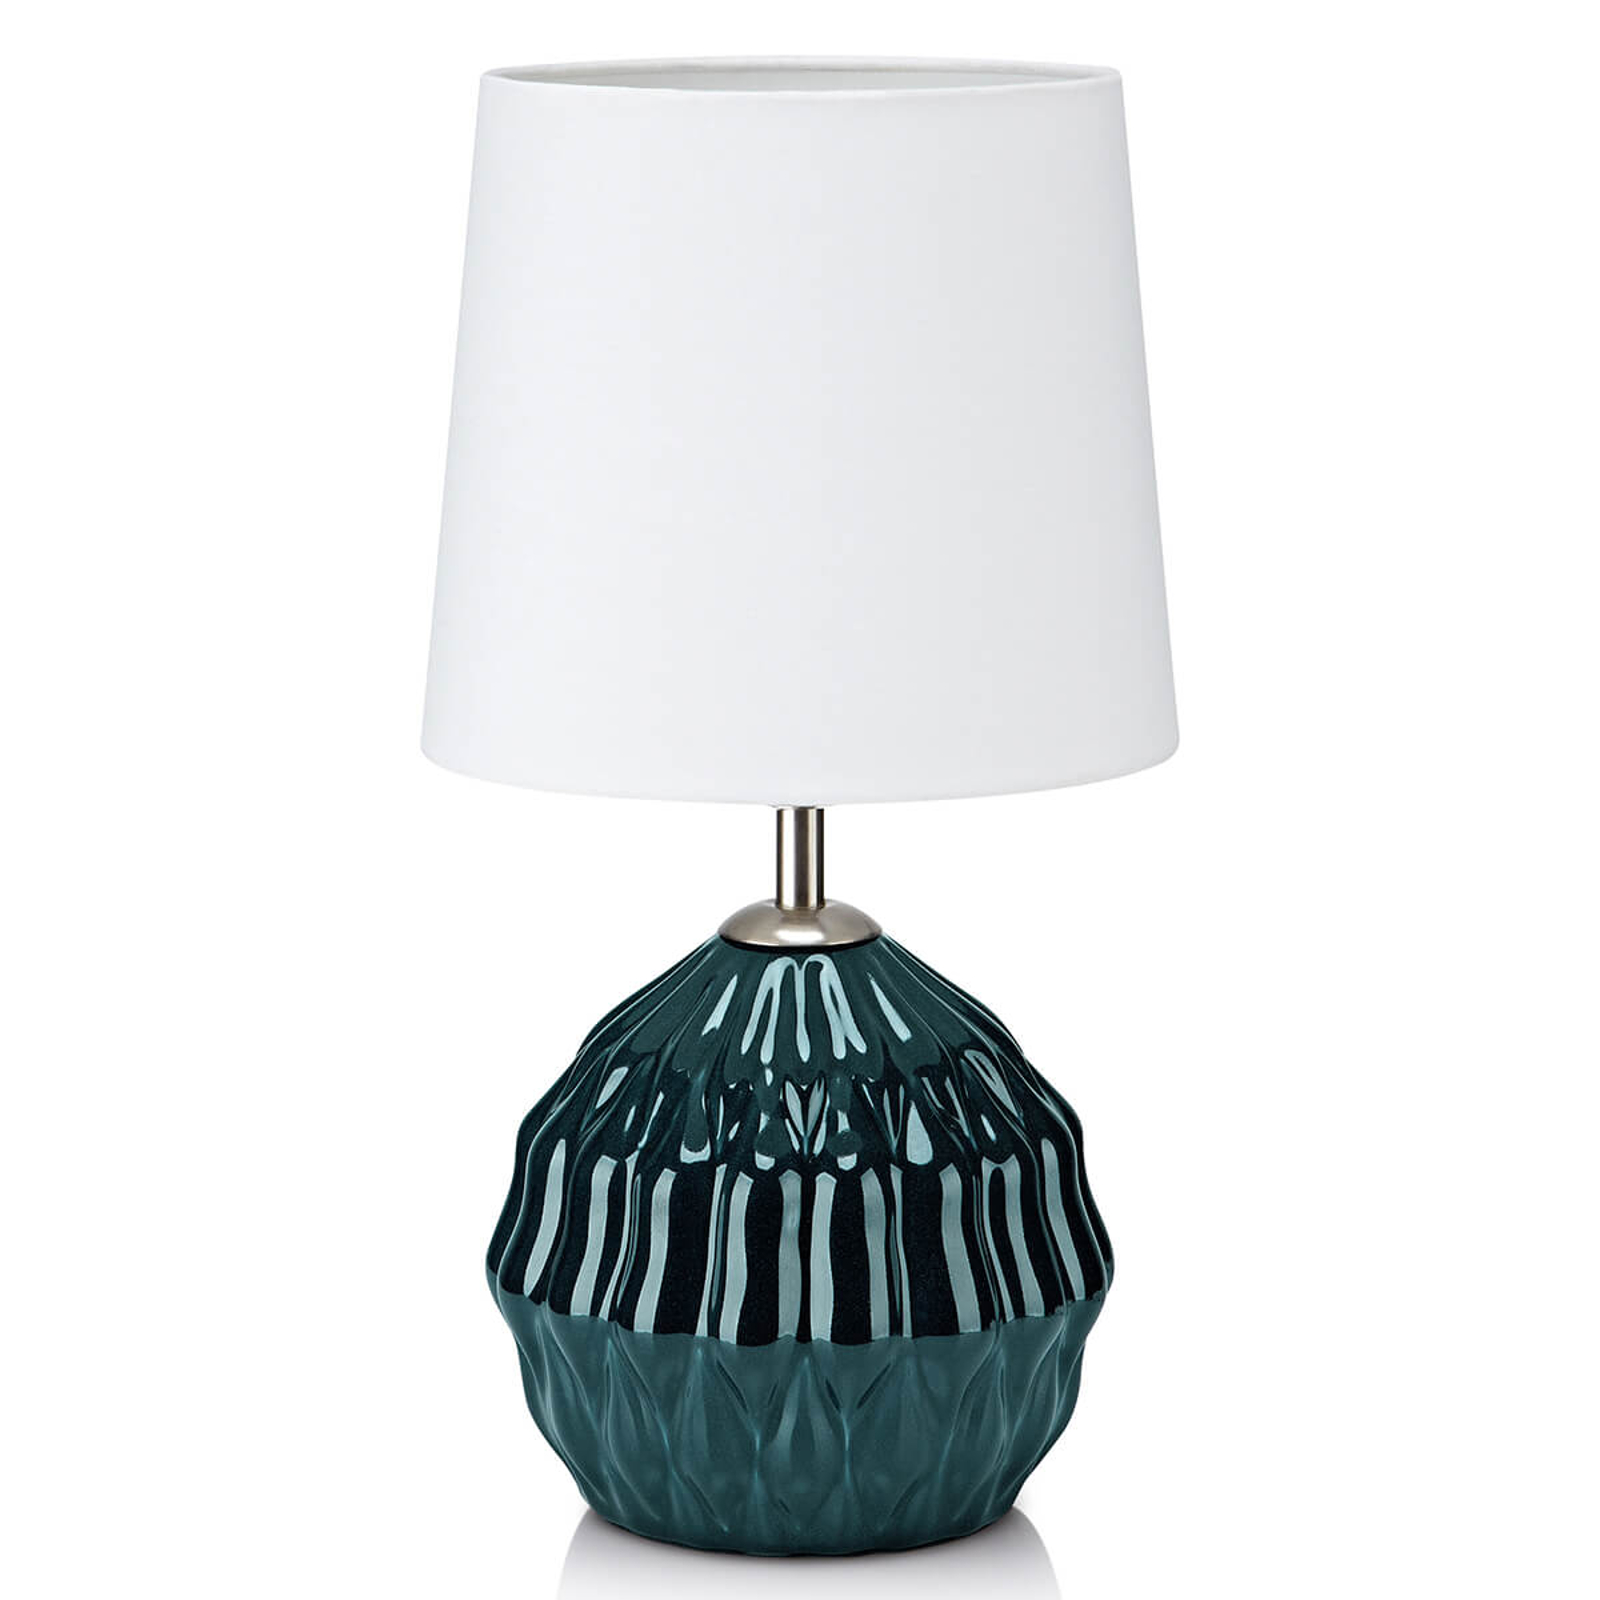 Groene keramische voet - stoffen tafellamp Lora